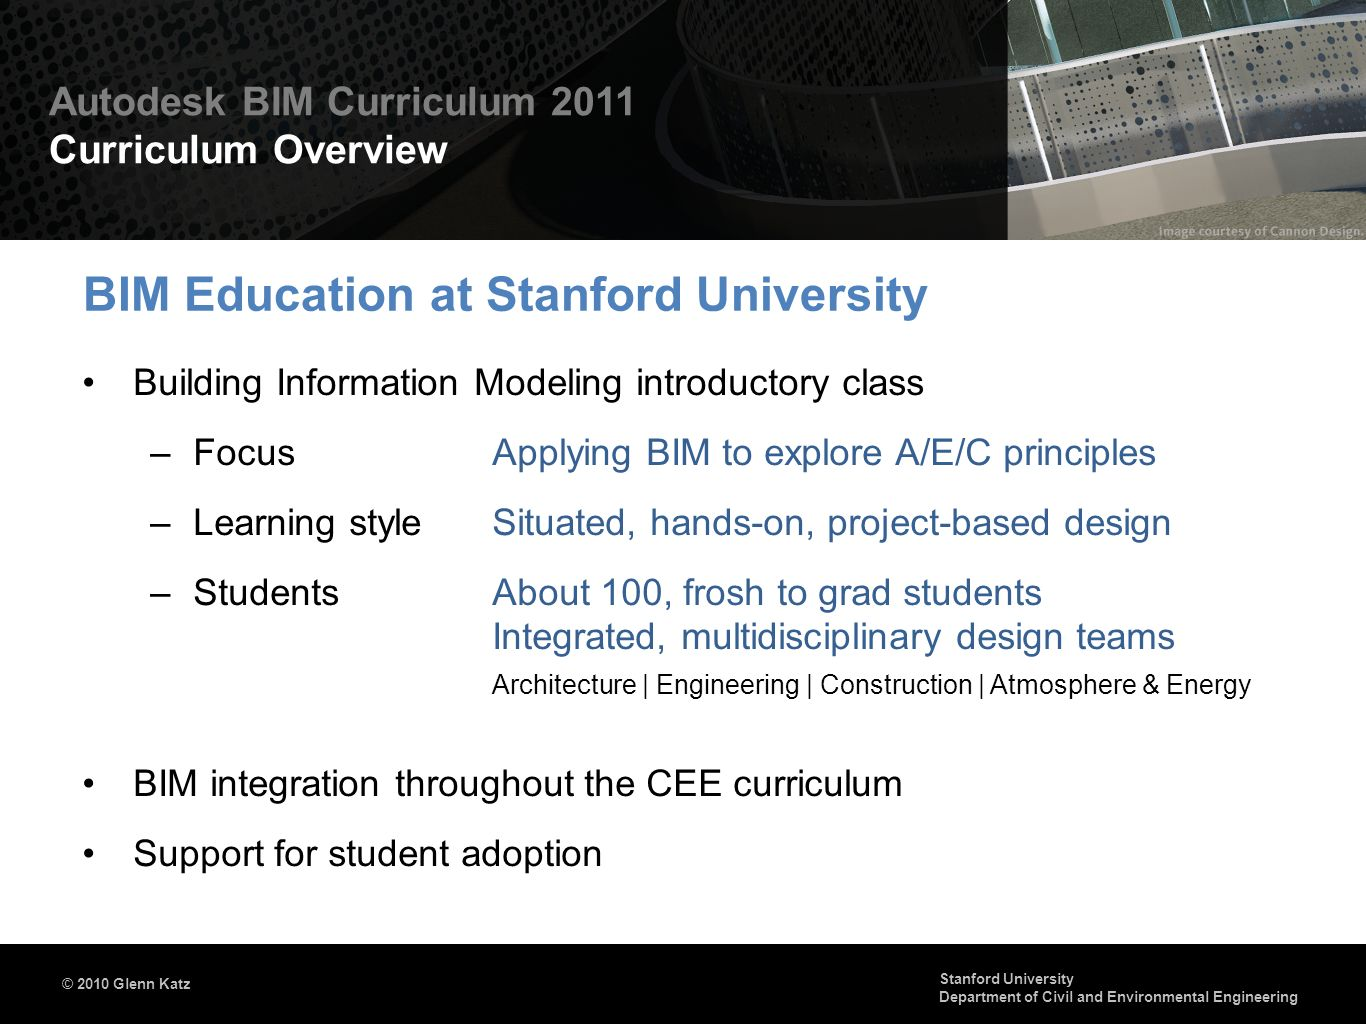 BIM Education at Stanford University